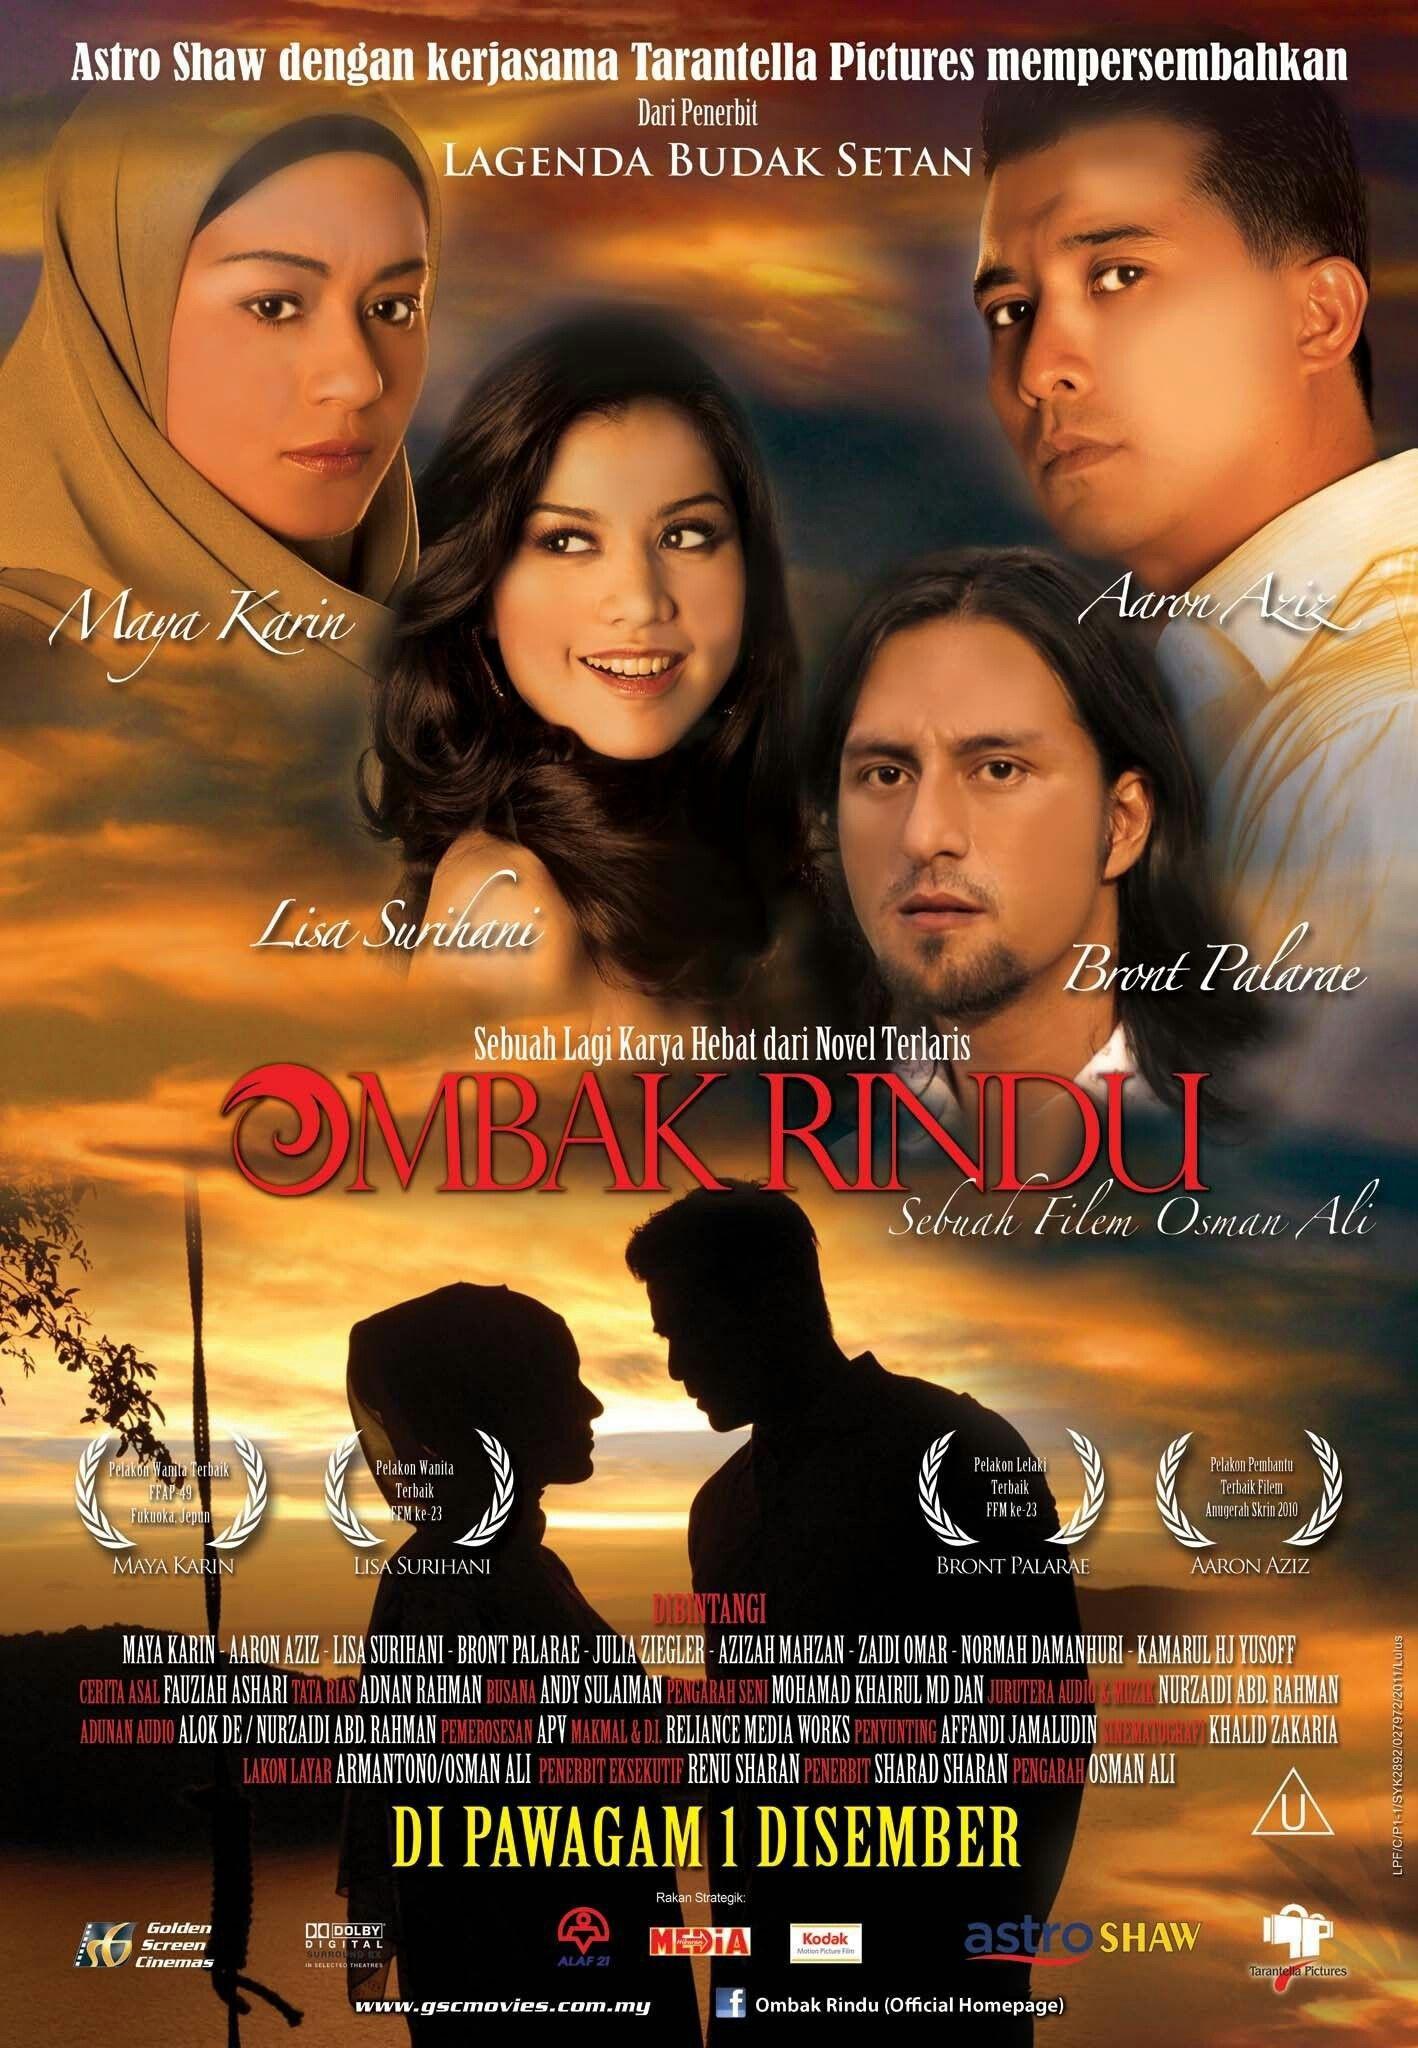 Once in Vegas filmi: aktörler ve roller, komplo